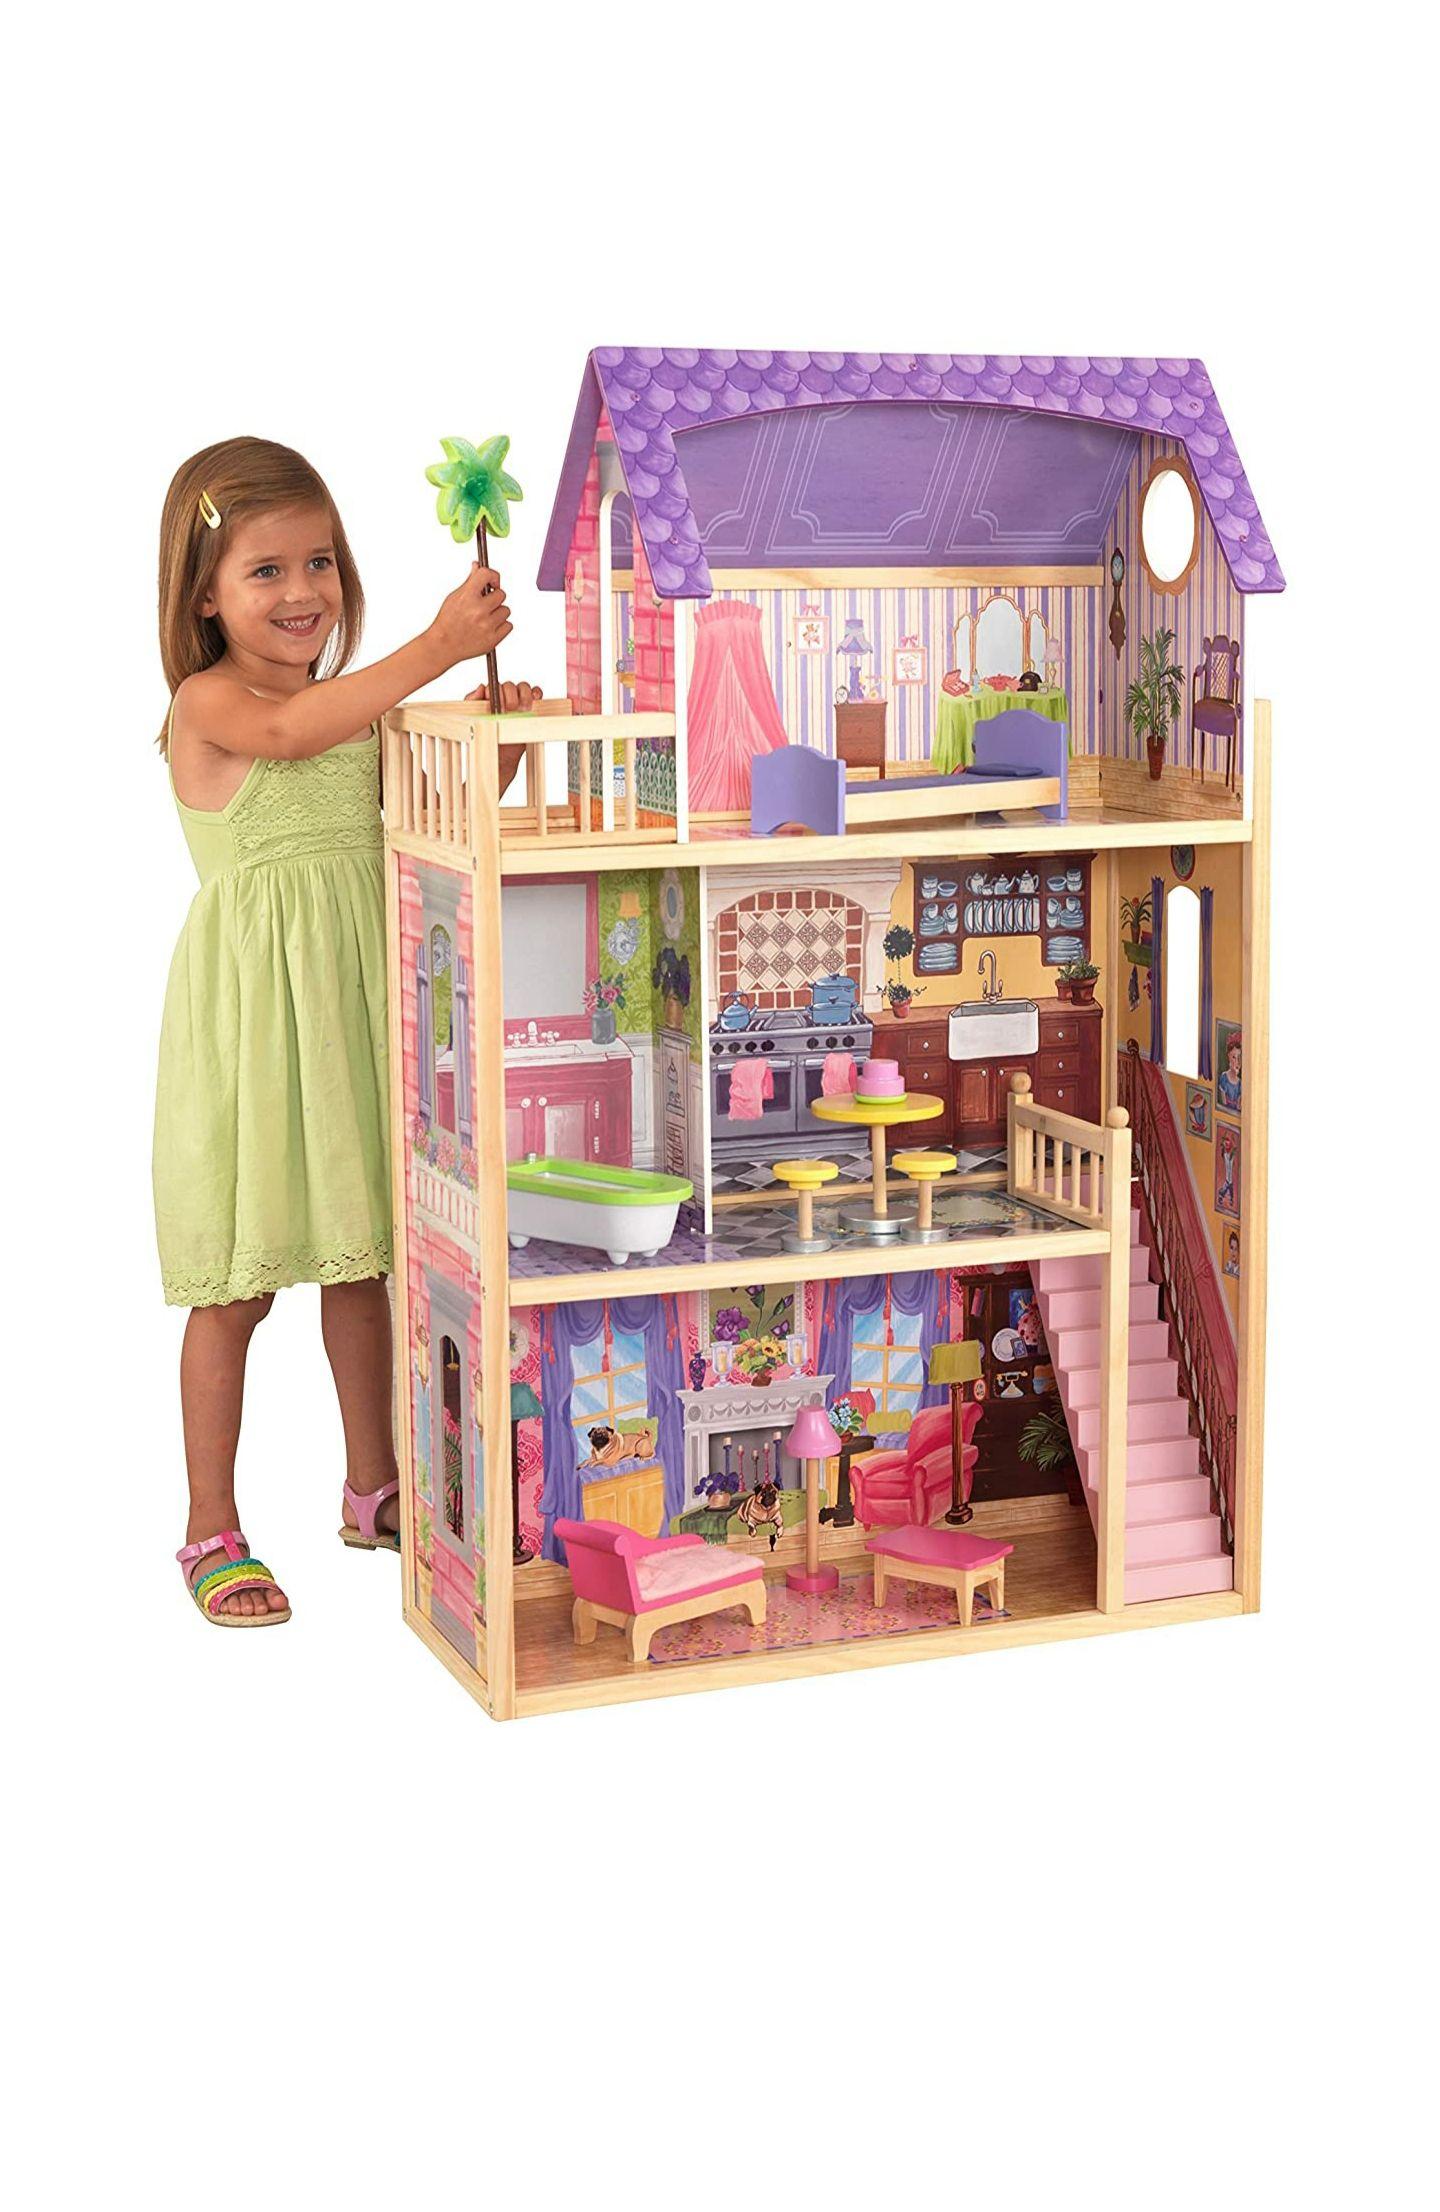 Maison de poupée en bois Kidkraft Kayla